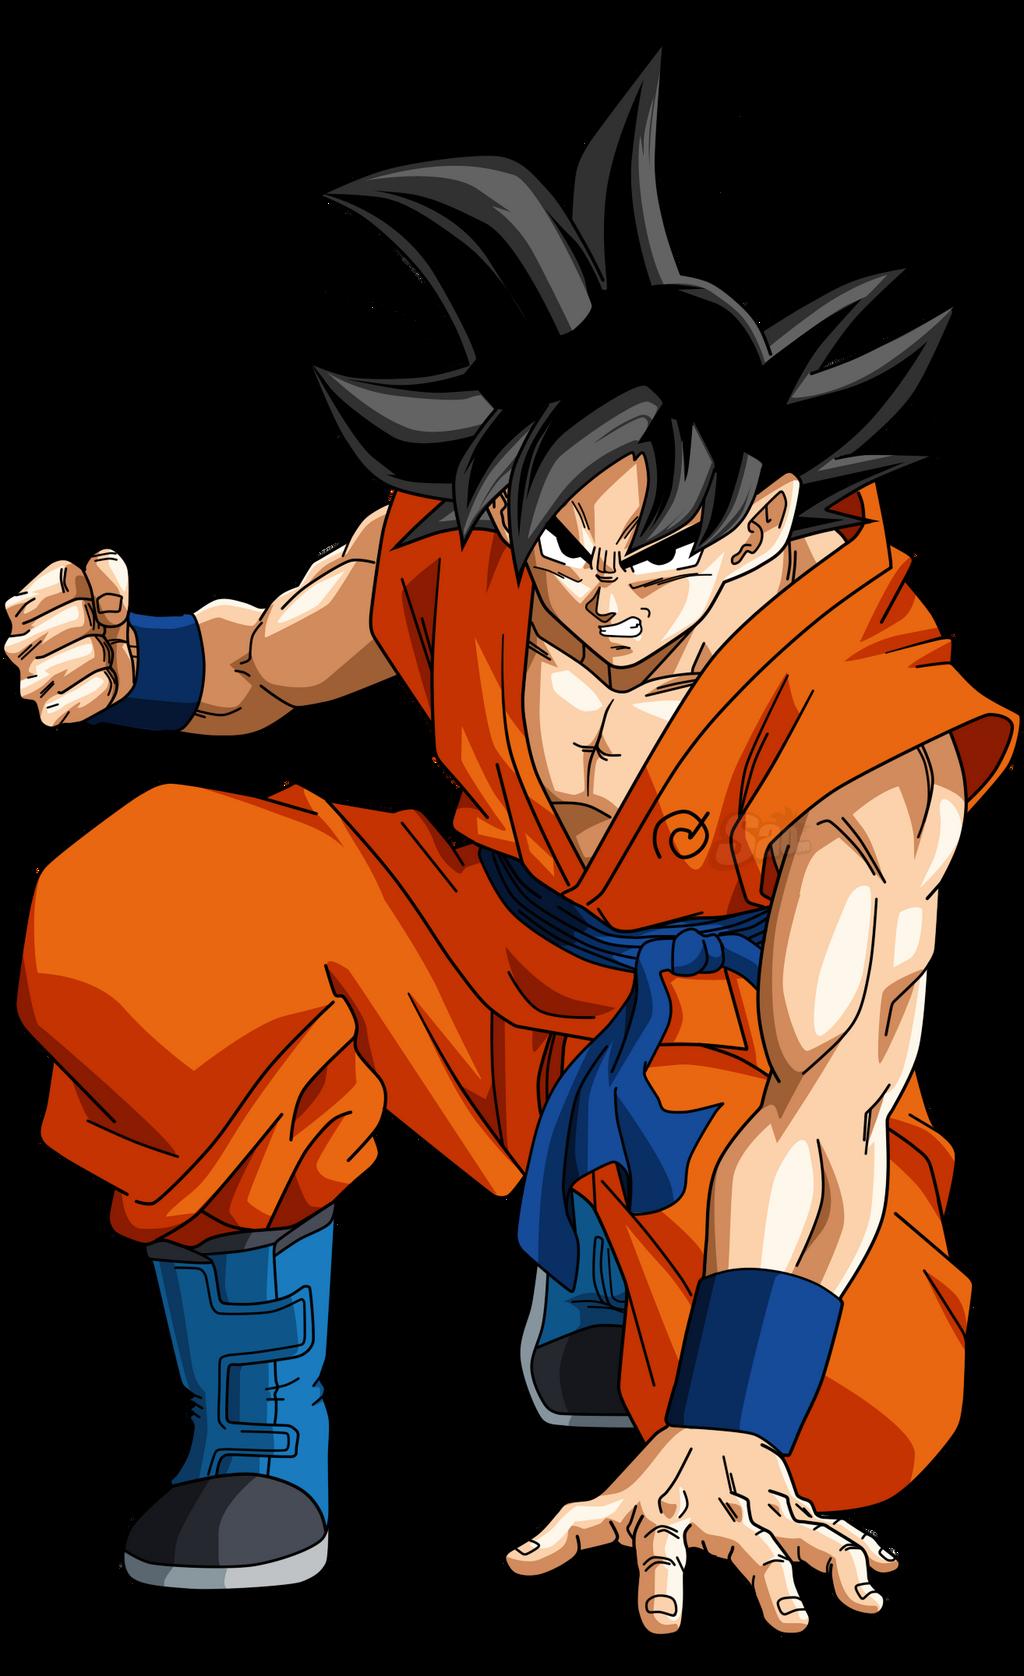 Goku Dbs 2 By Saodvd On Deviantart